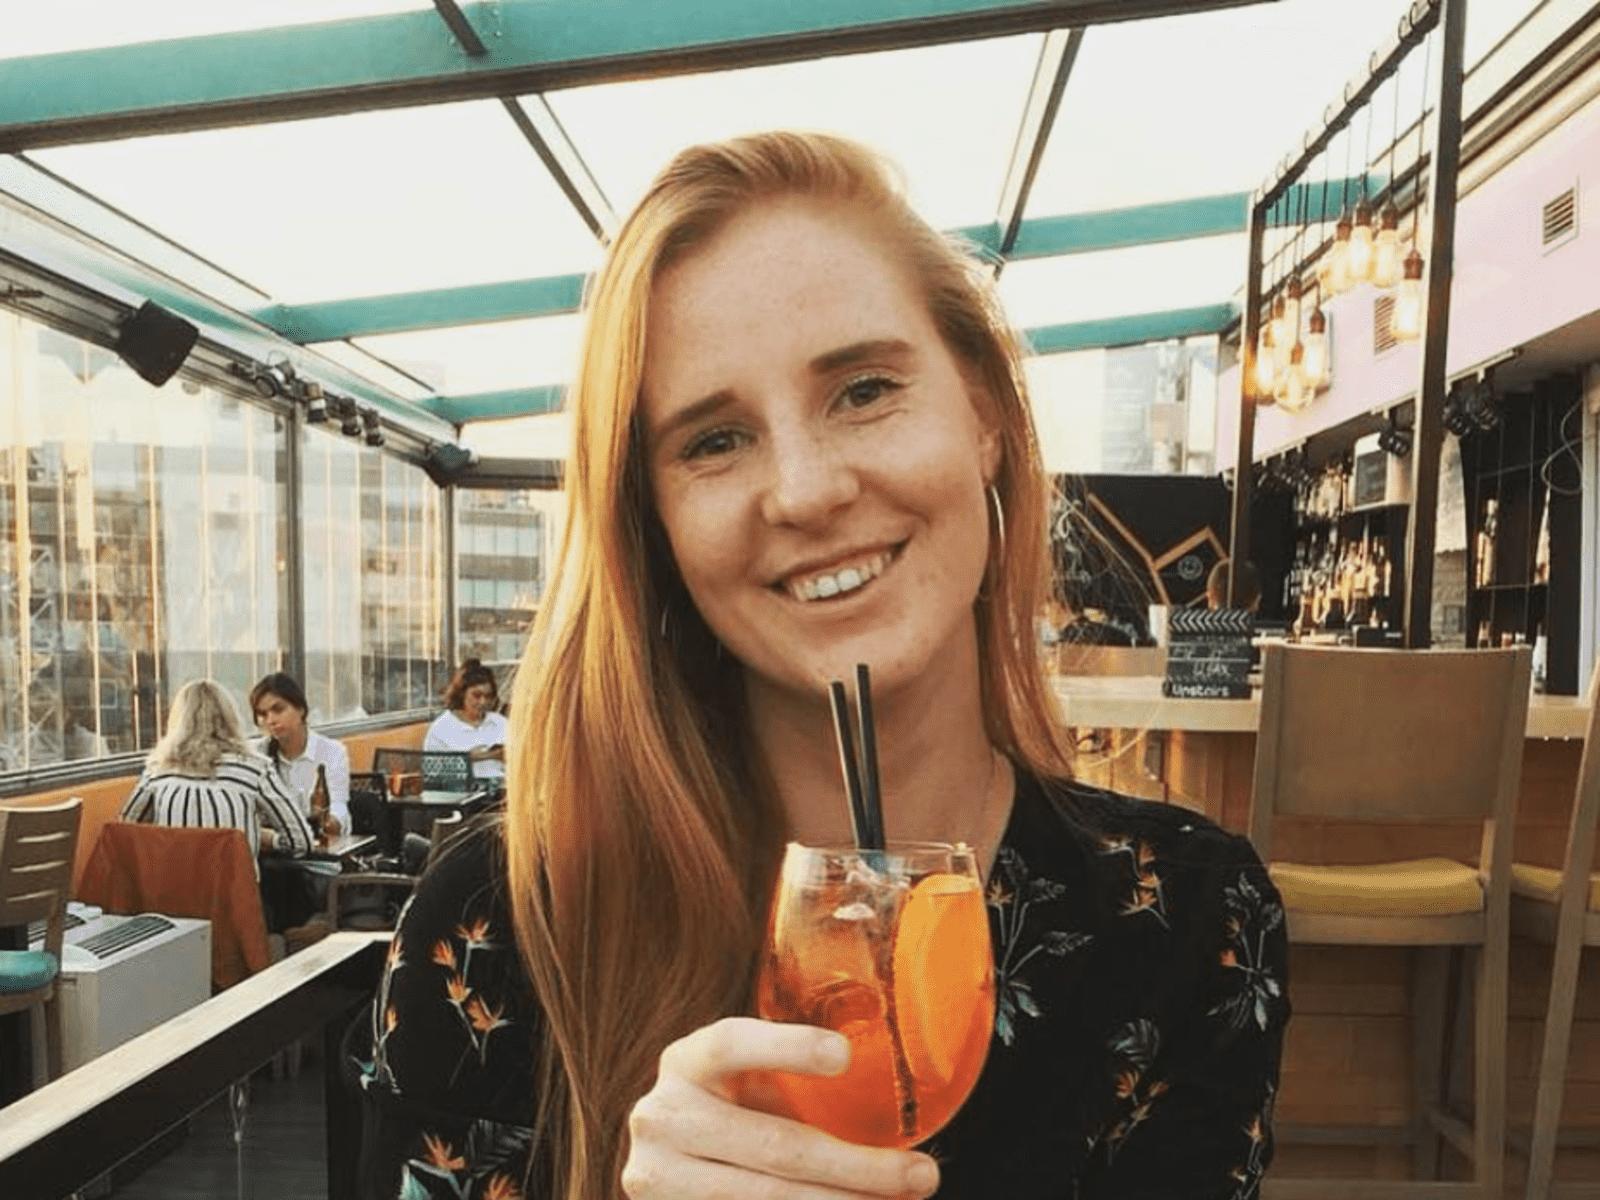 Sadie from London, United Kingdom